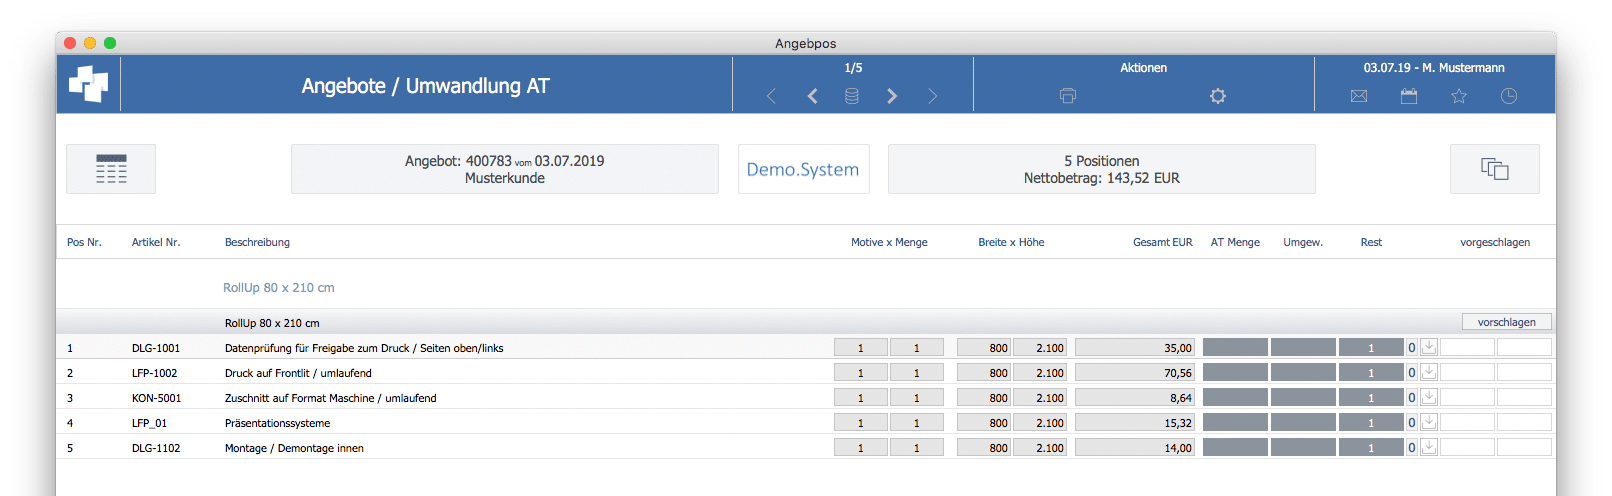 advanter 5.0 Angebot / Positionsliste